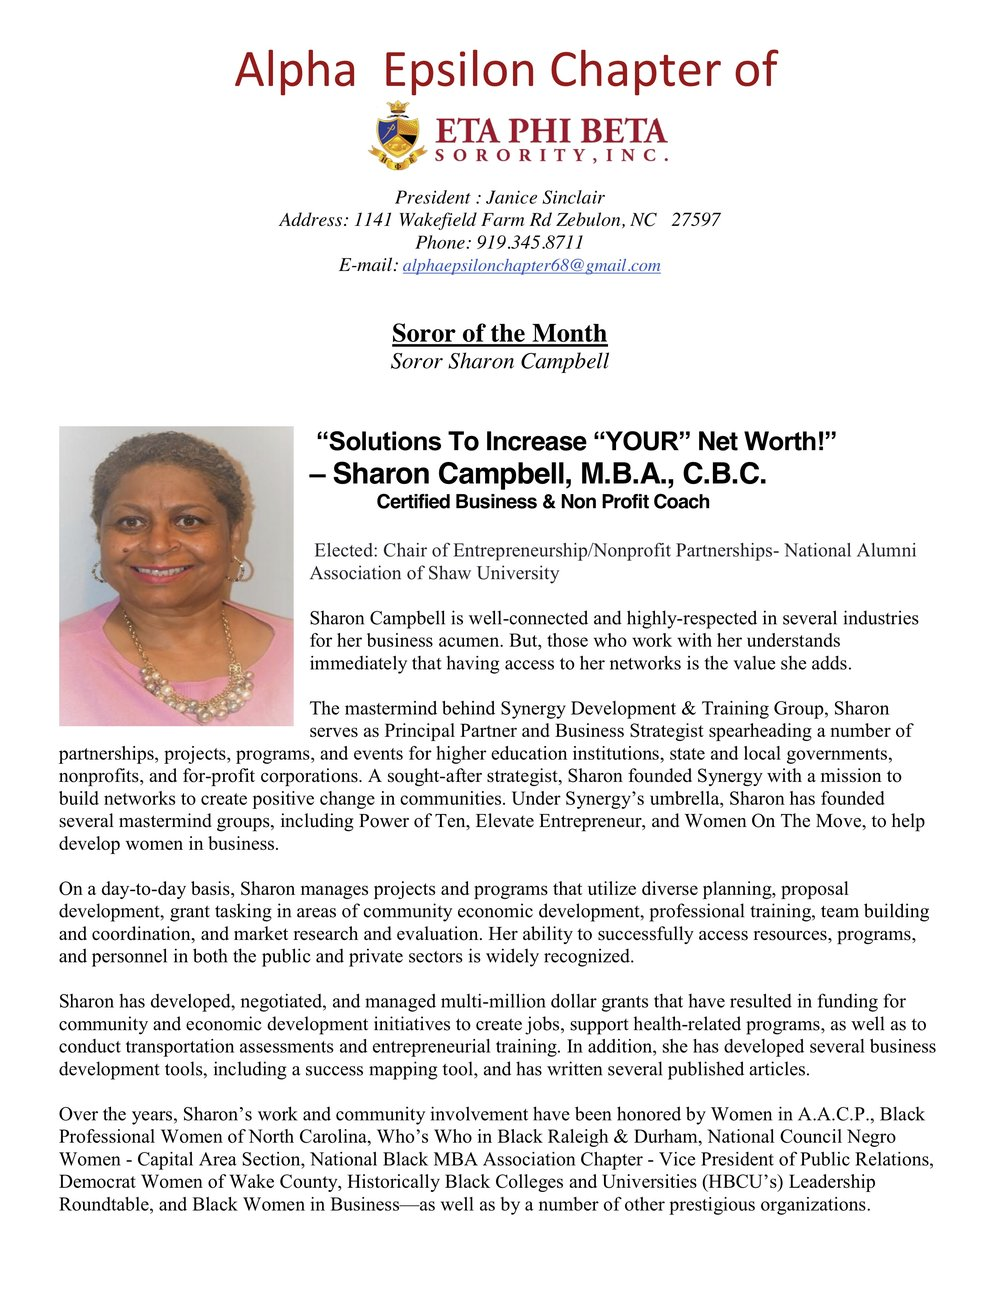 Alpha Epsilon's Soror of the Month Sharon Campbell.jpg